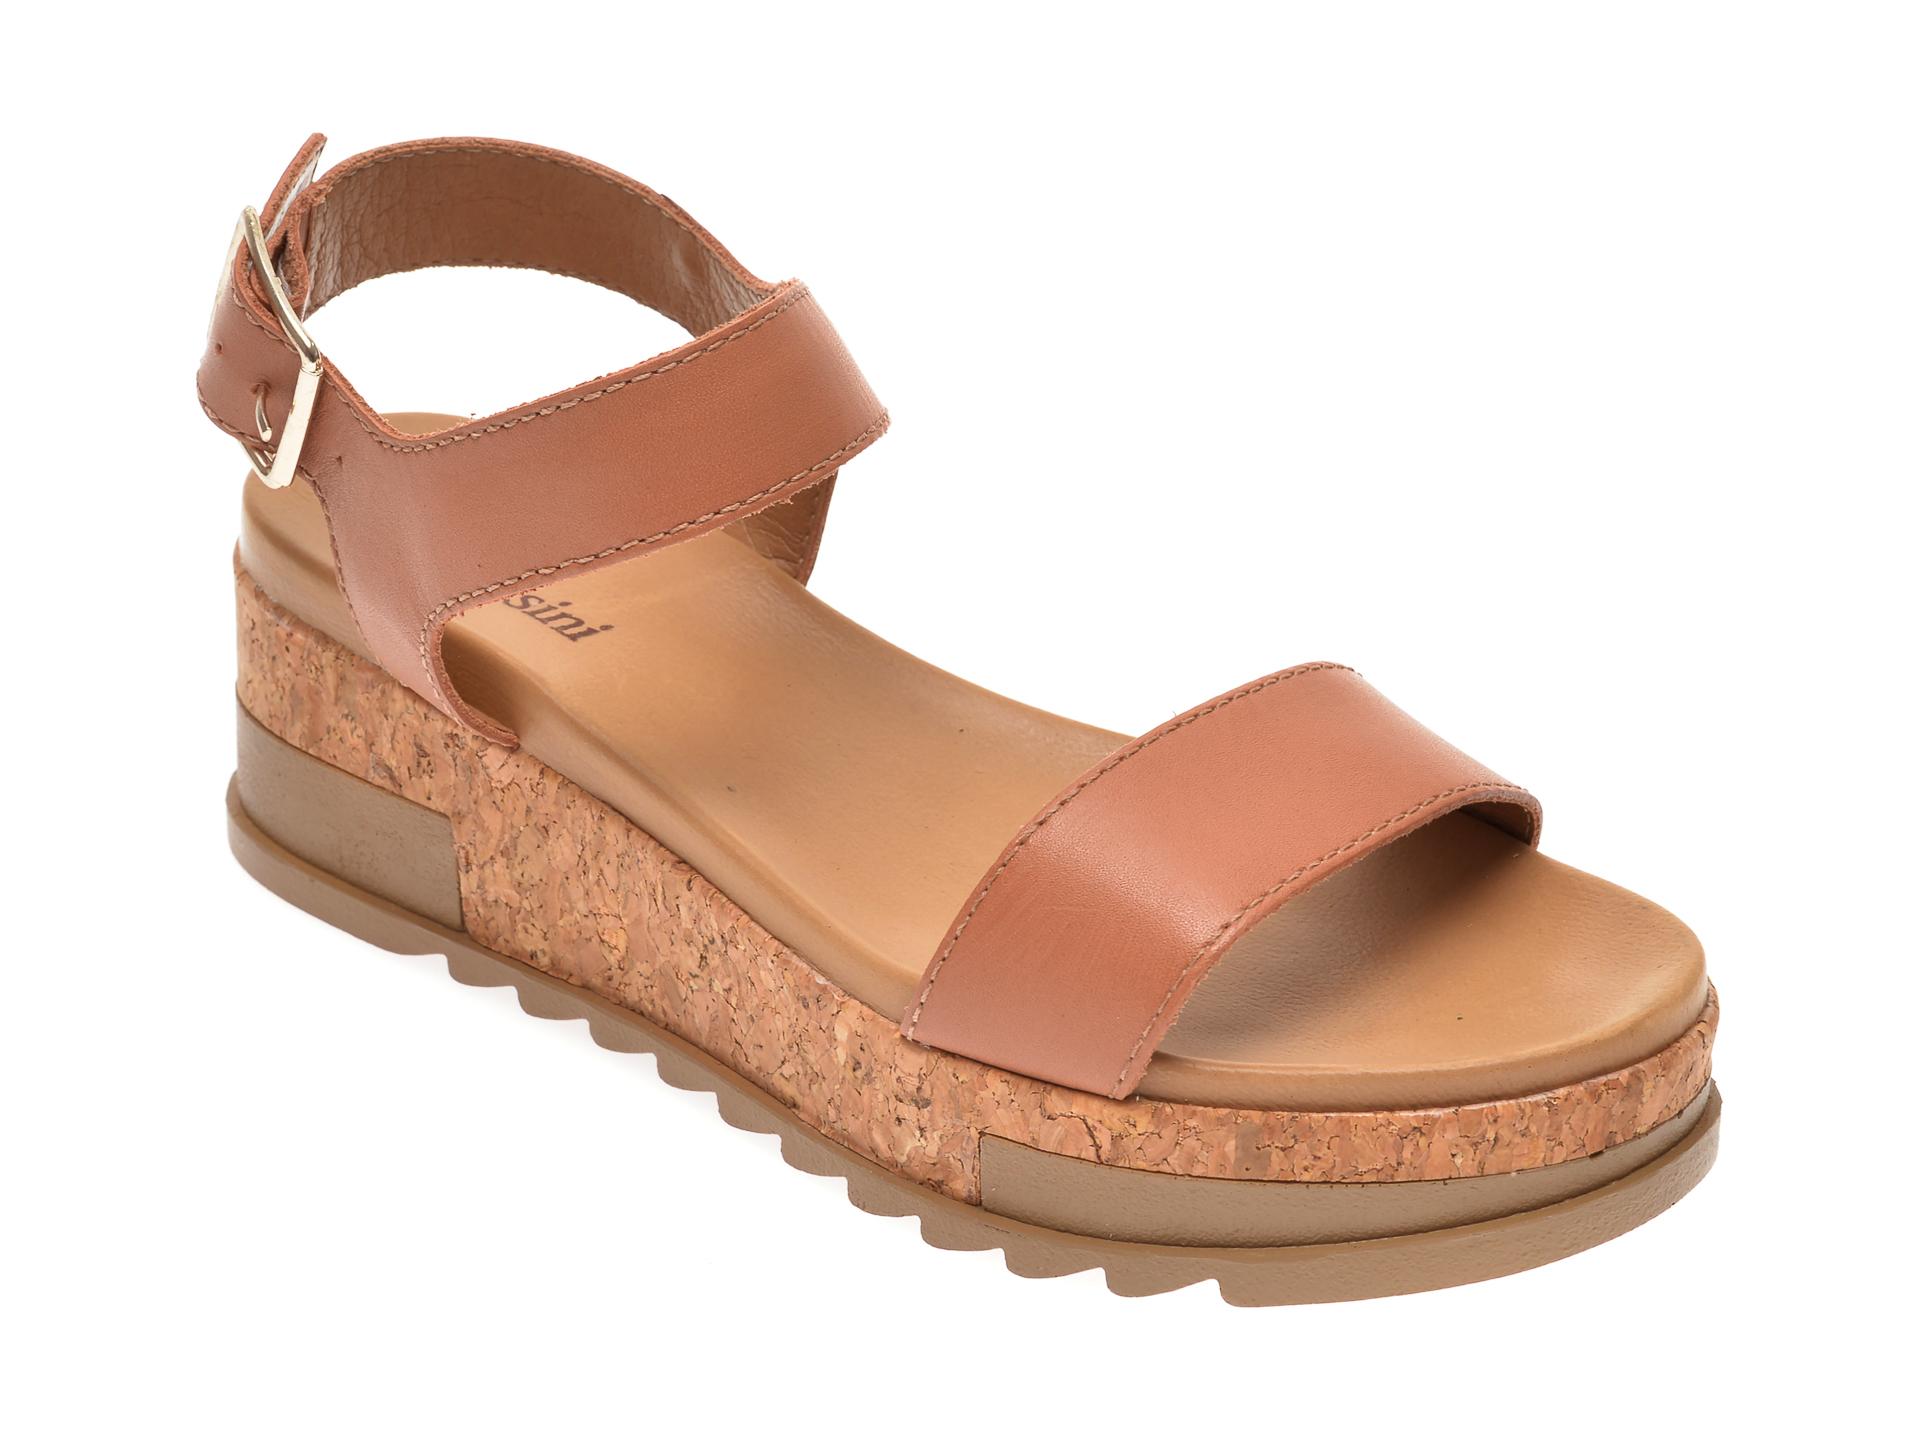 Sandale FLAVIA PASSINI nude, 306601, din piele naturala